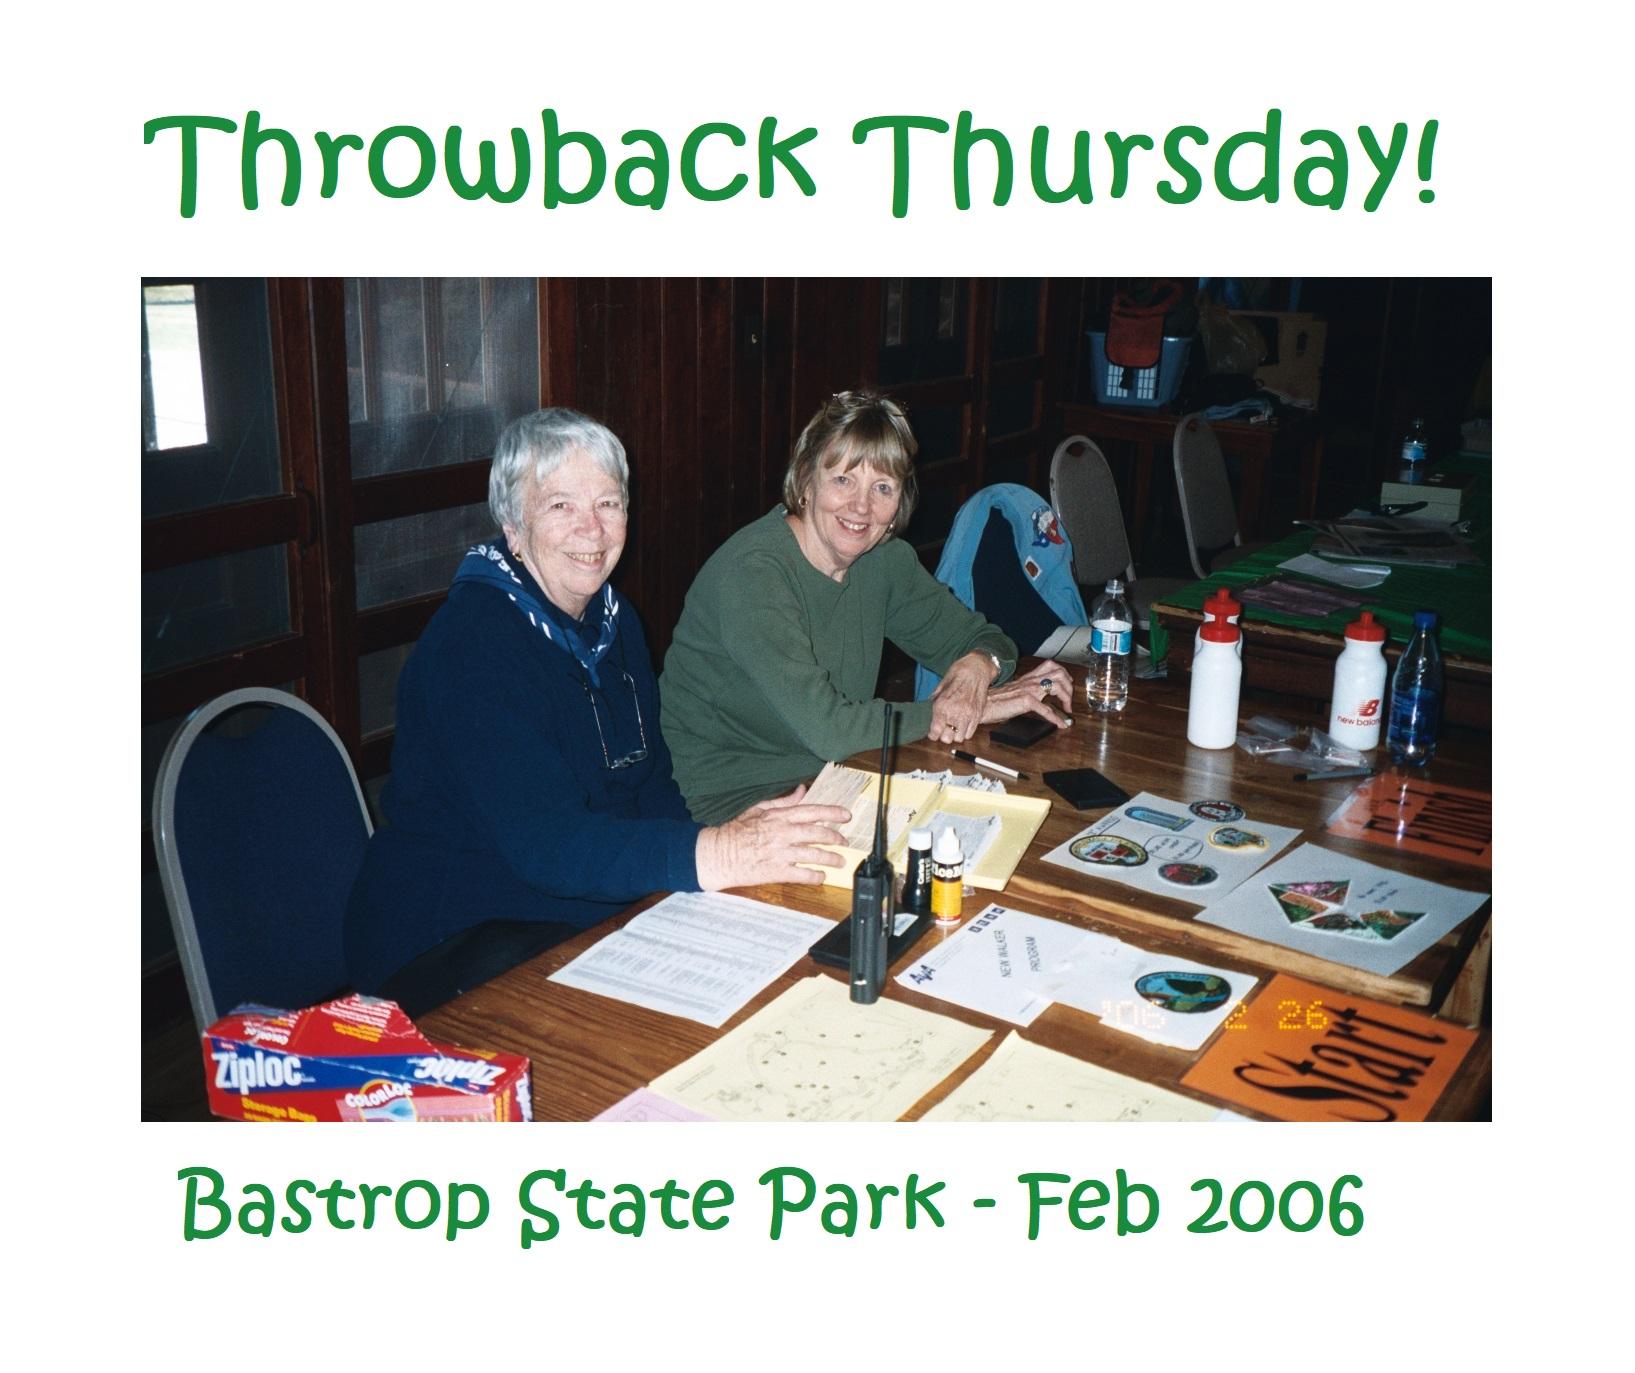 Bastrop State Park Walk, February 2006